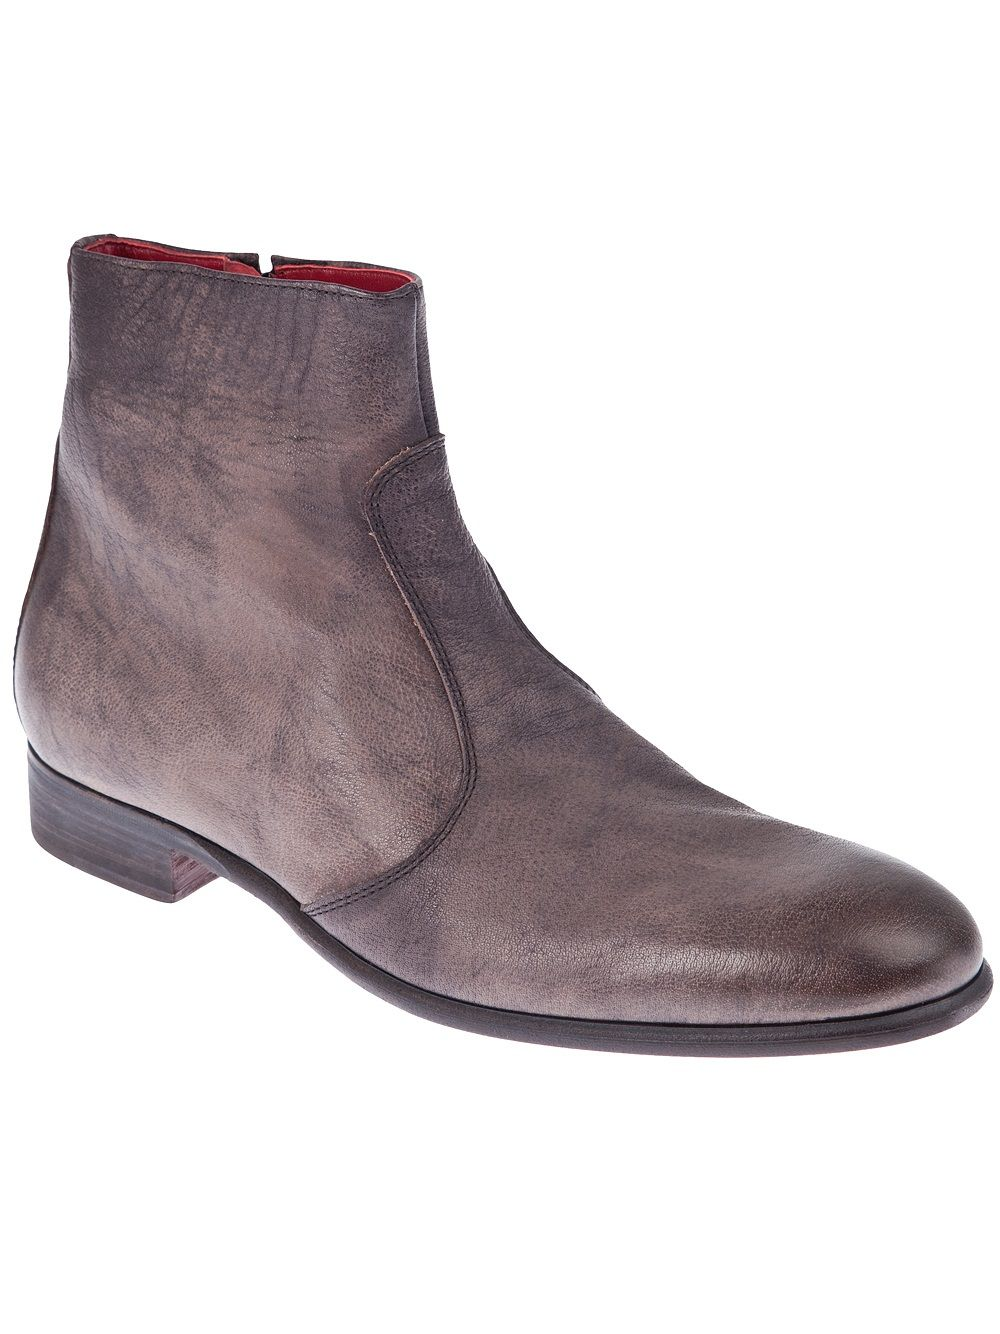 Jean-Michel Cazabat Ankle boot